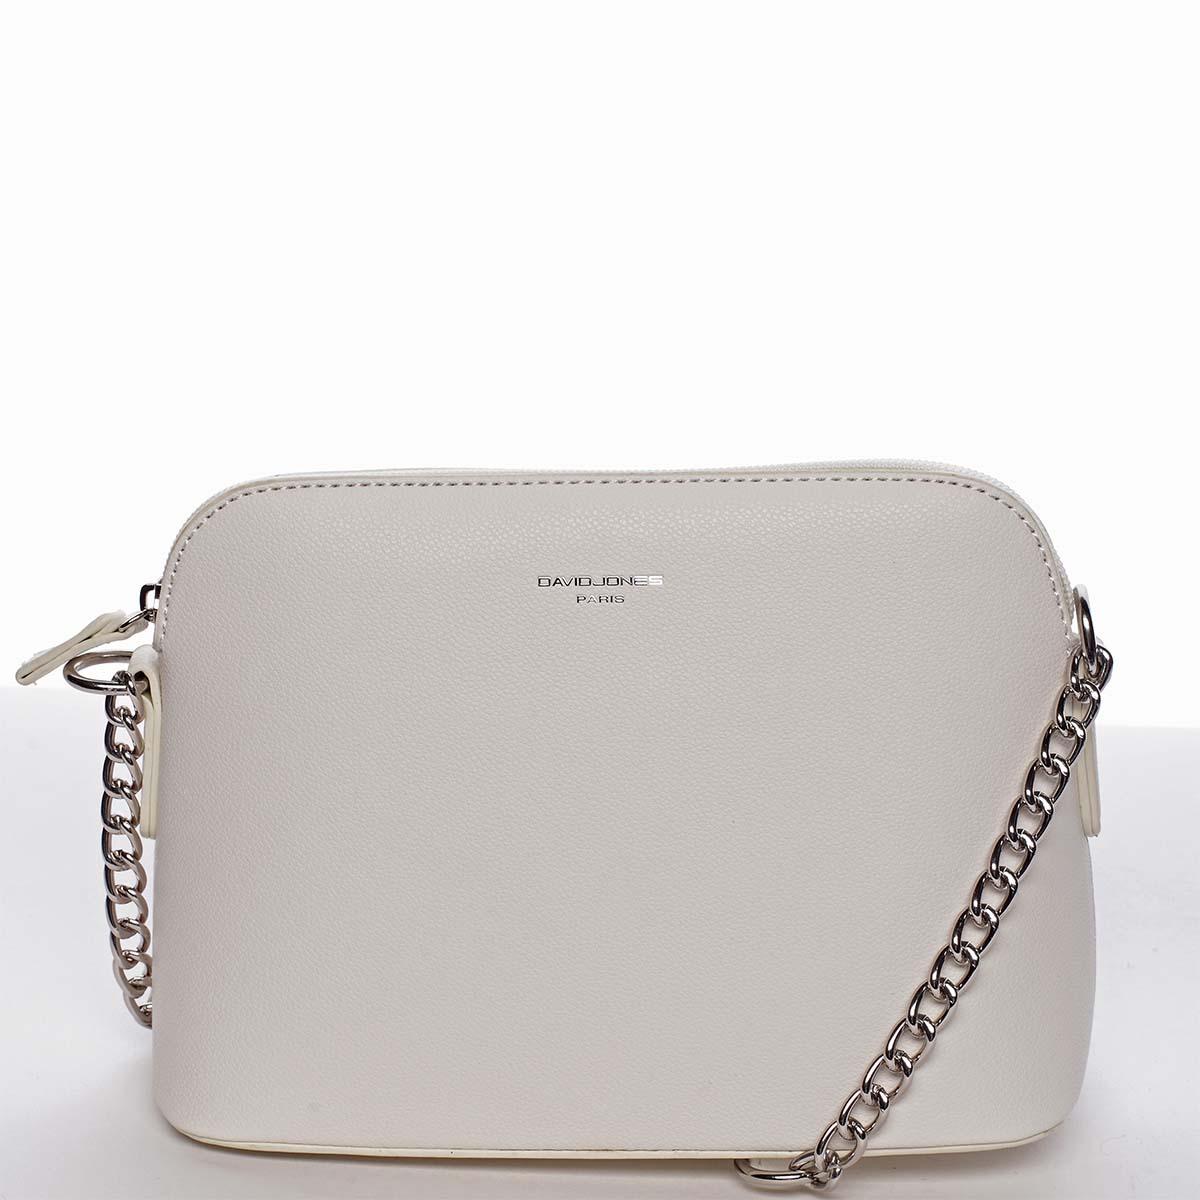 Osobitá a elegantní dámská bílá crossbody kabelka - David Jones Milagros